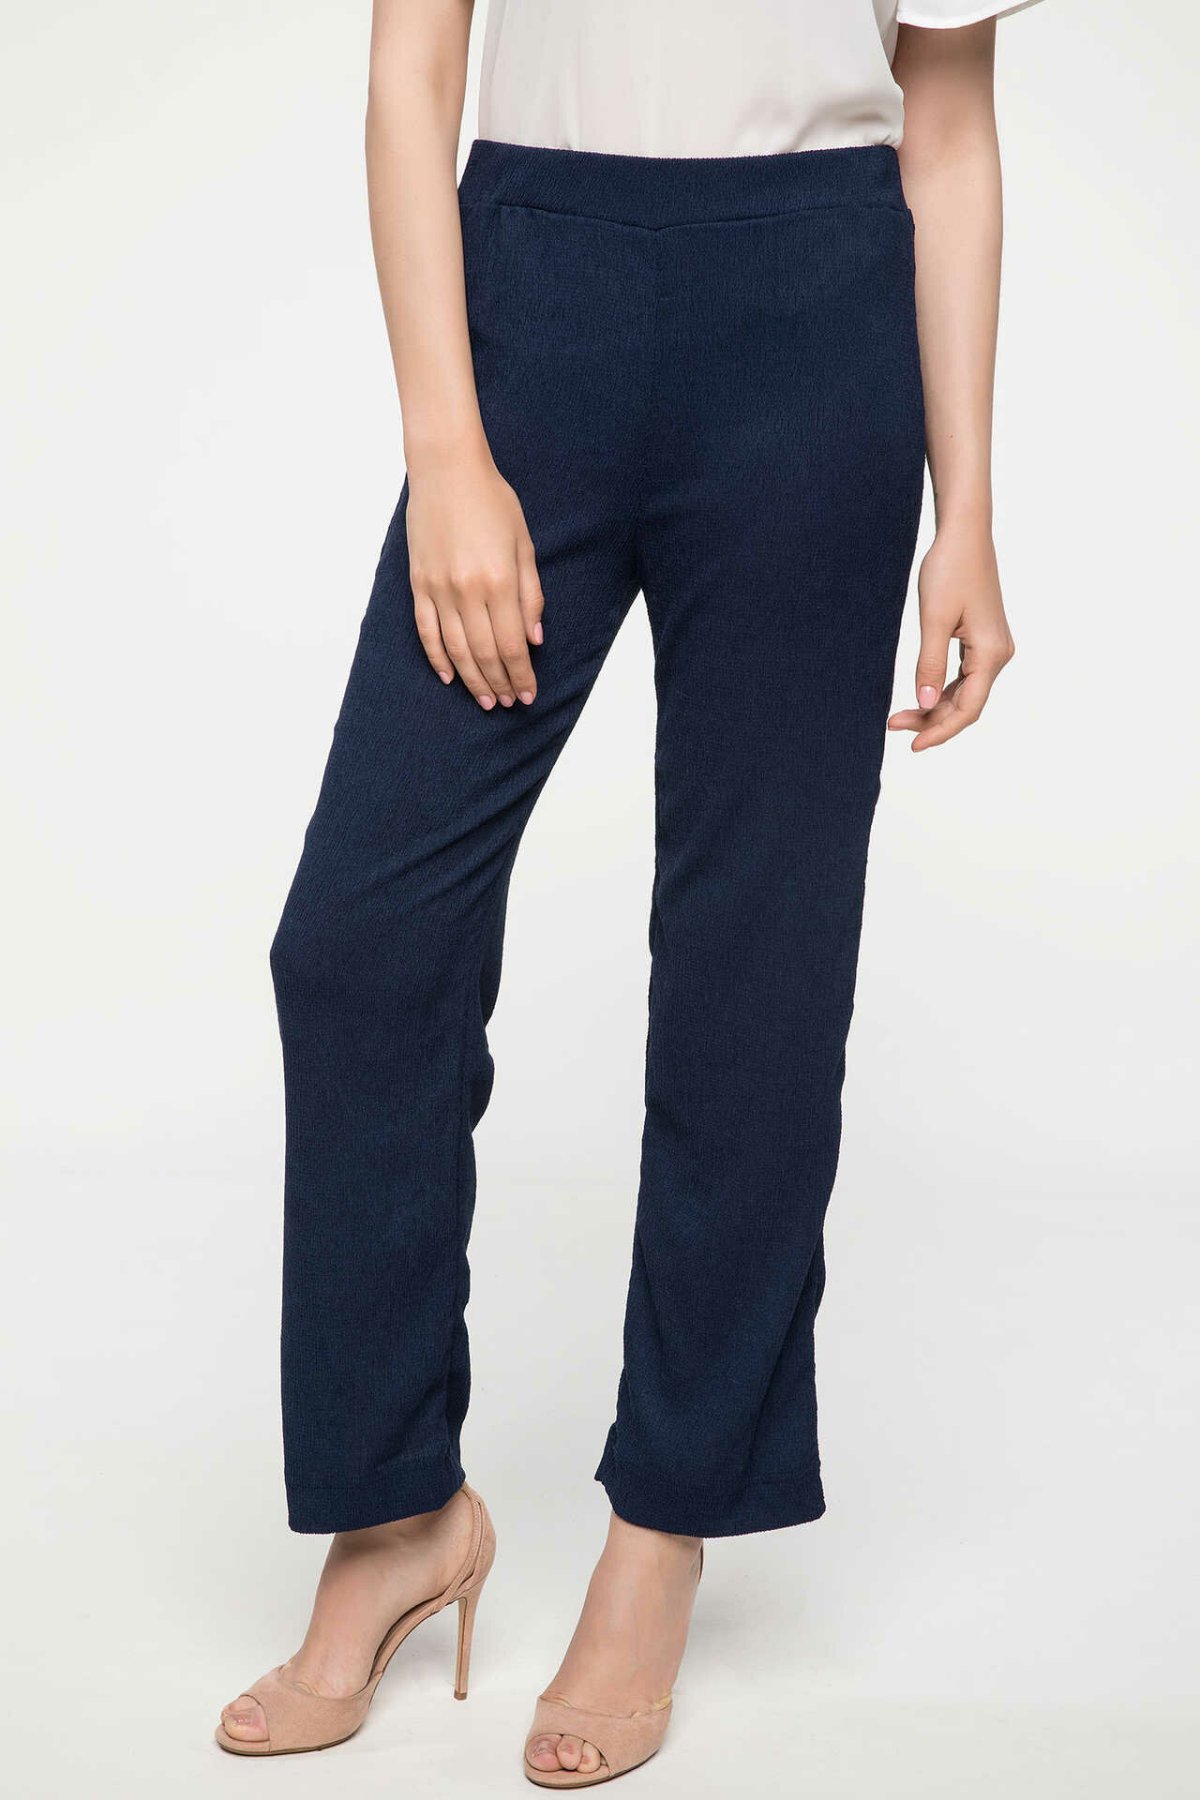 DeFacto Women Fashion Joker Trouser Ladies Casual High Elastic Straight Pants Female Casual High Quality Long Pants-J4825AZ18SM